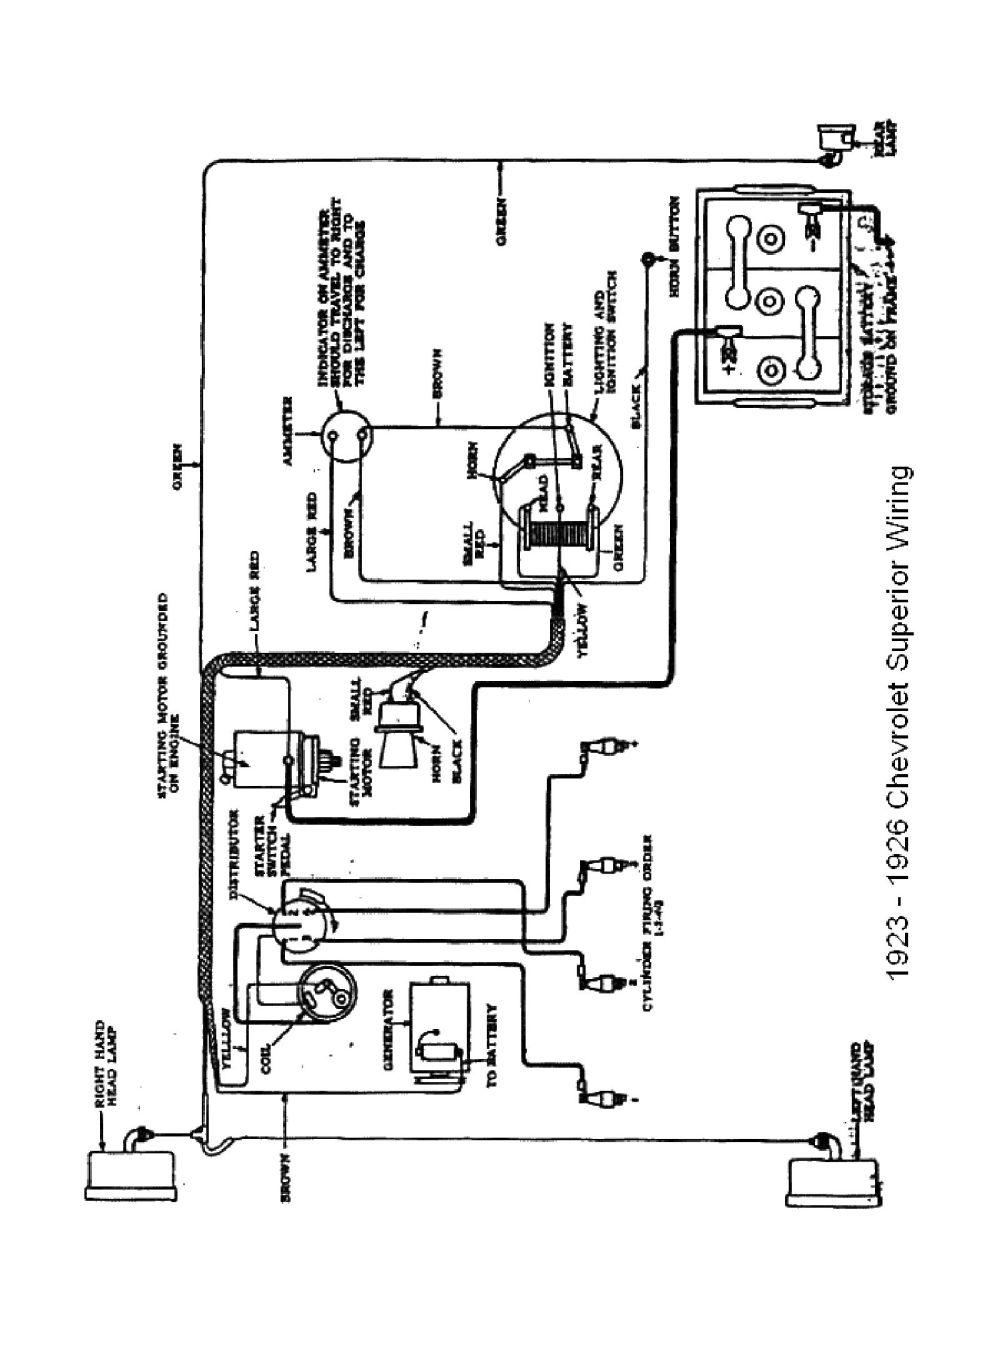 medium resolution of 1923 superior model 1923 superior model